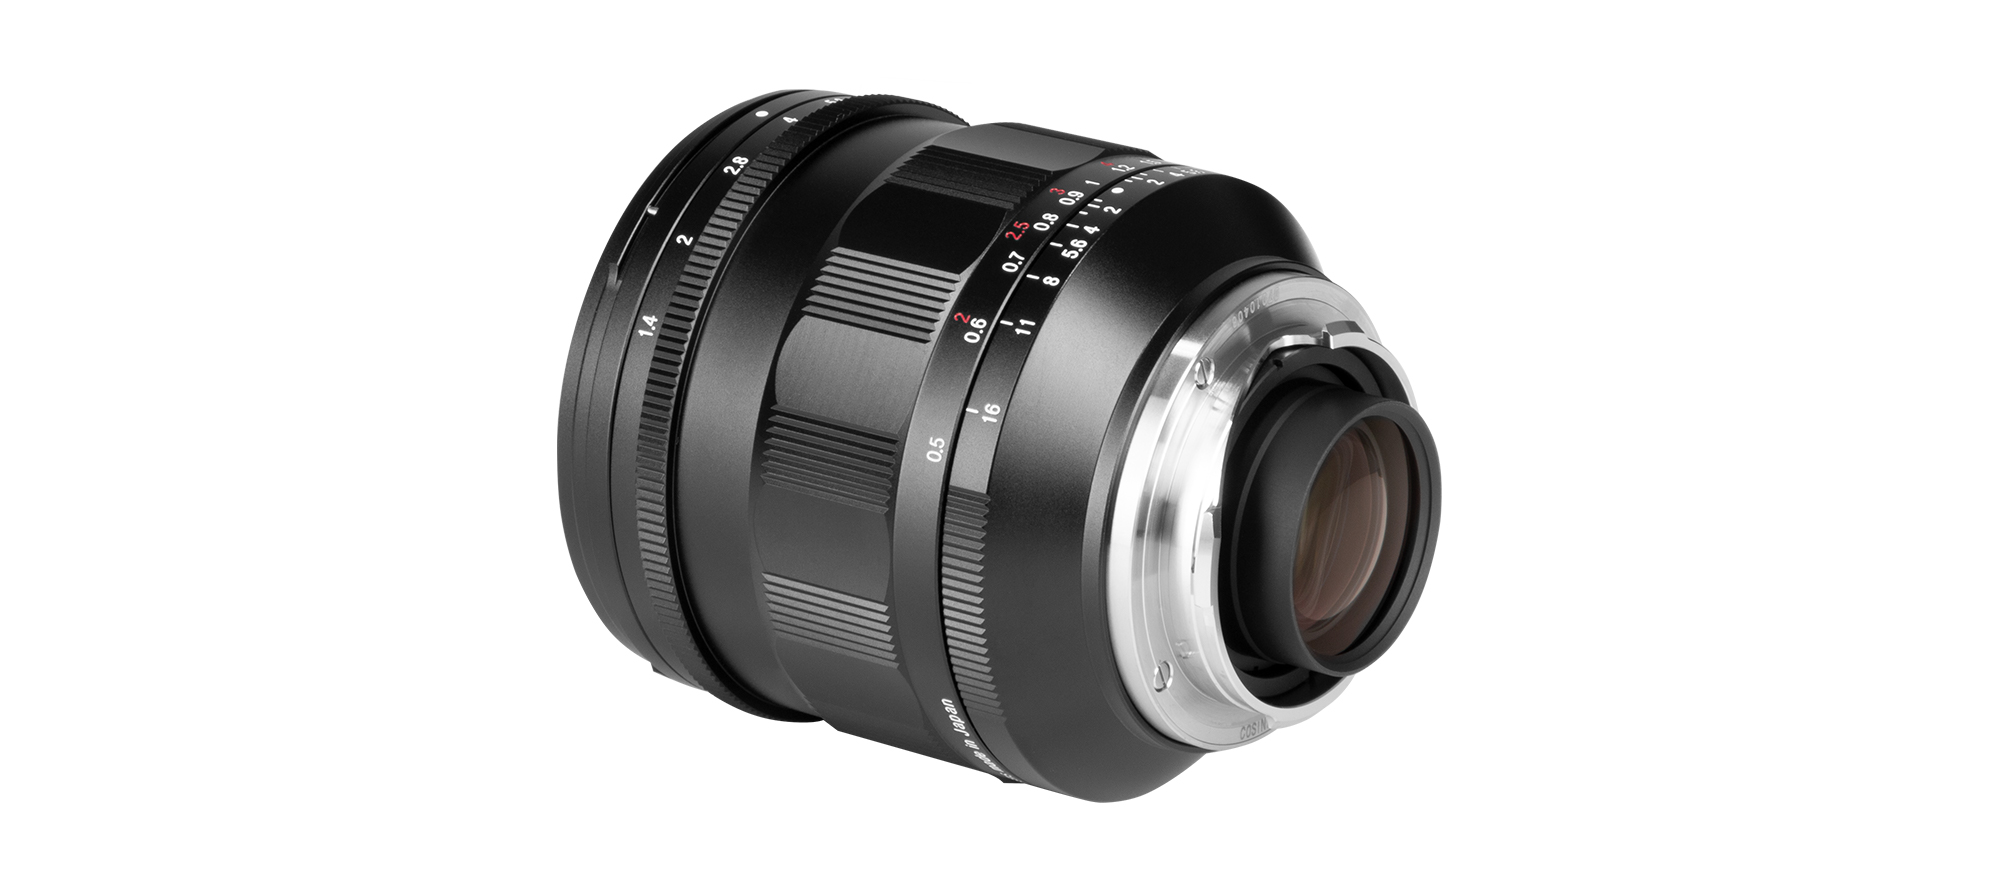 Voigtlander Nokton 21 mm f/1.4 lens with Leica M mount bayonet lens